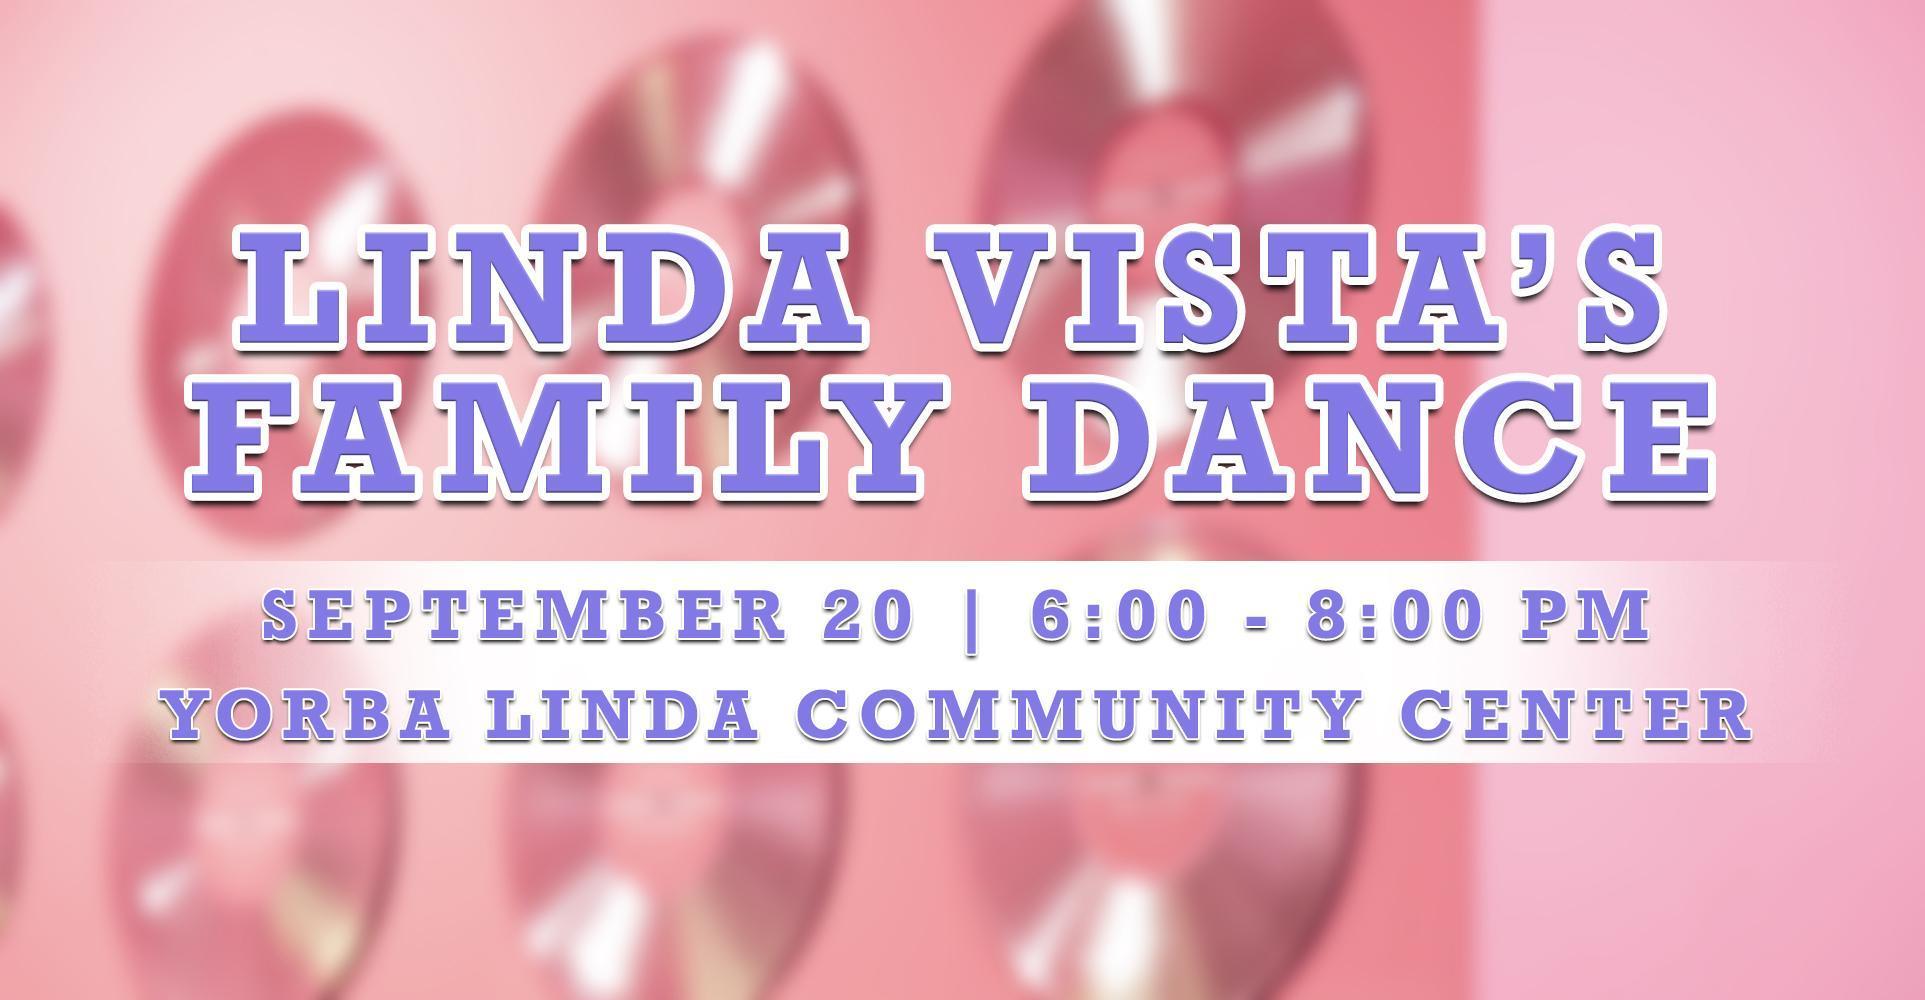 Linda Vista's Family Dance